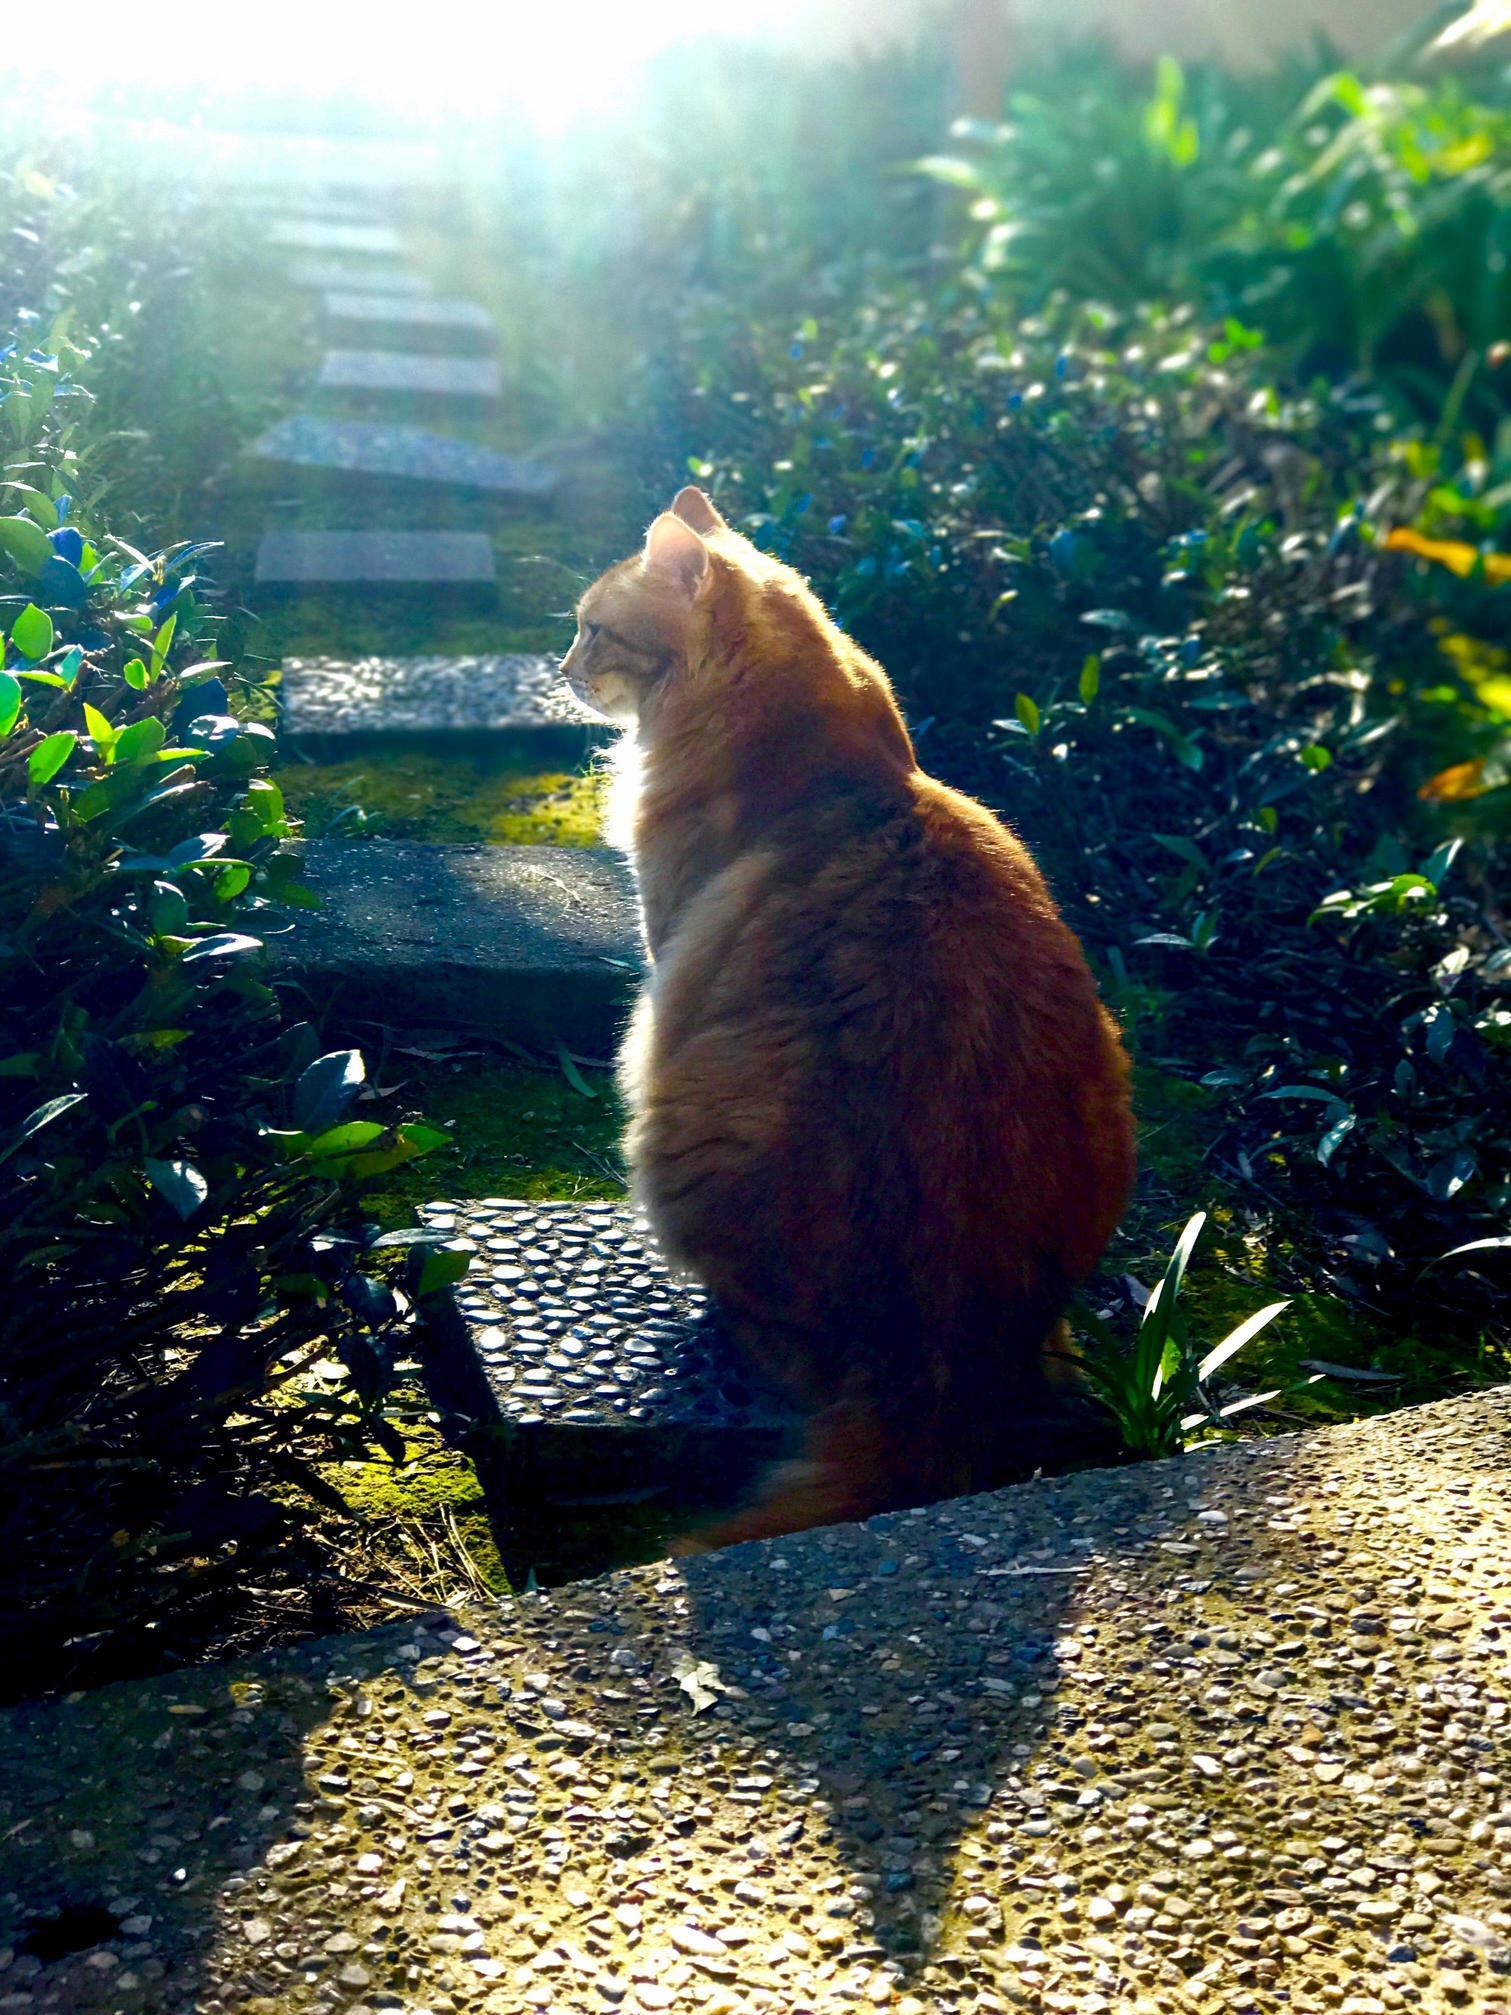 Goku in the garden